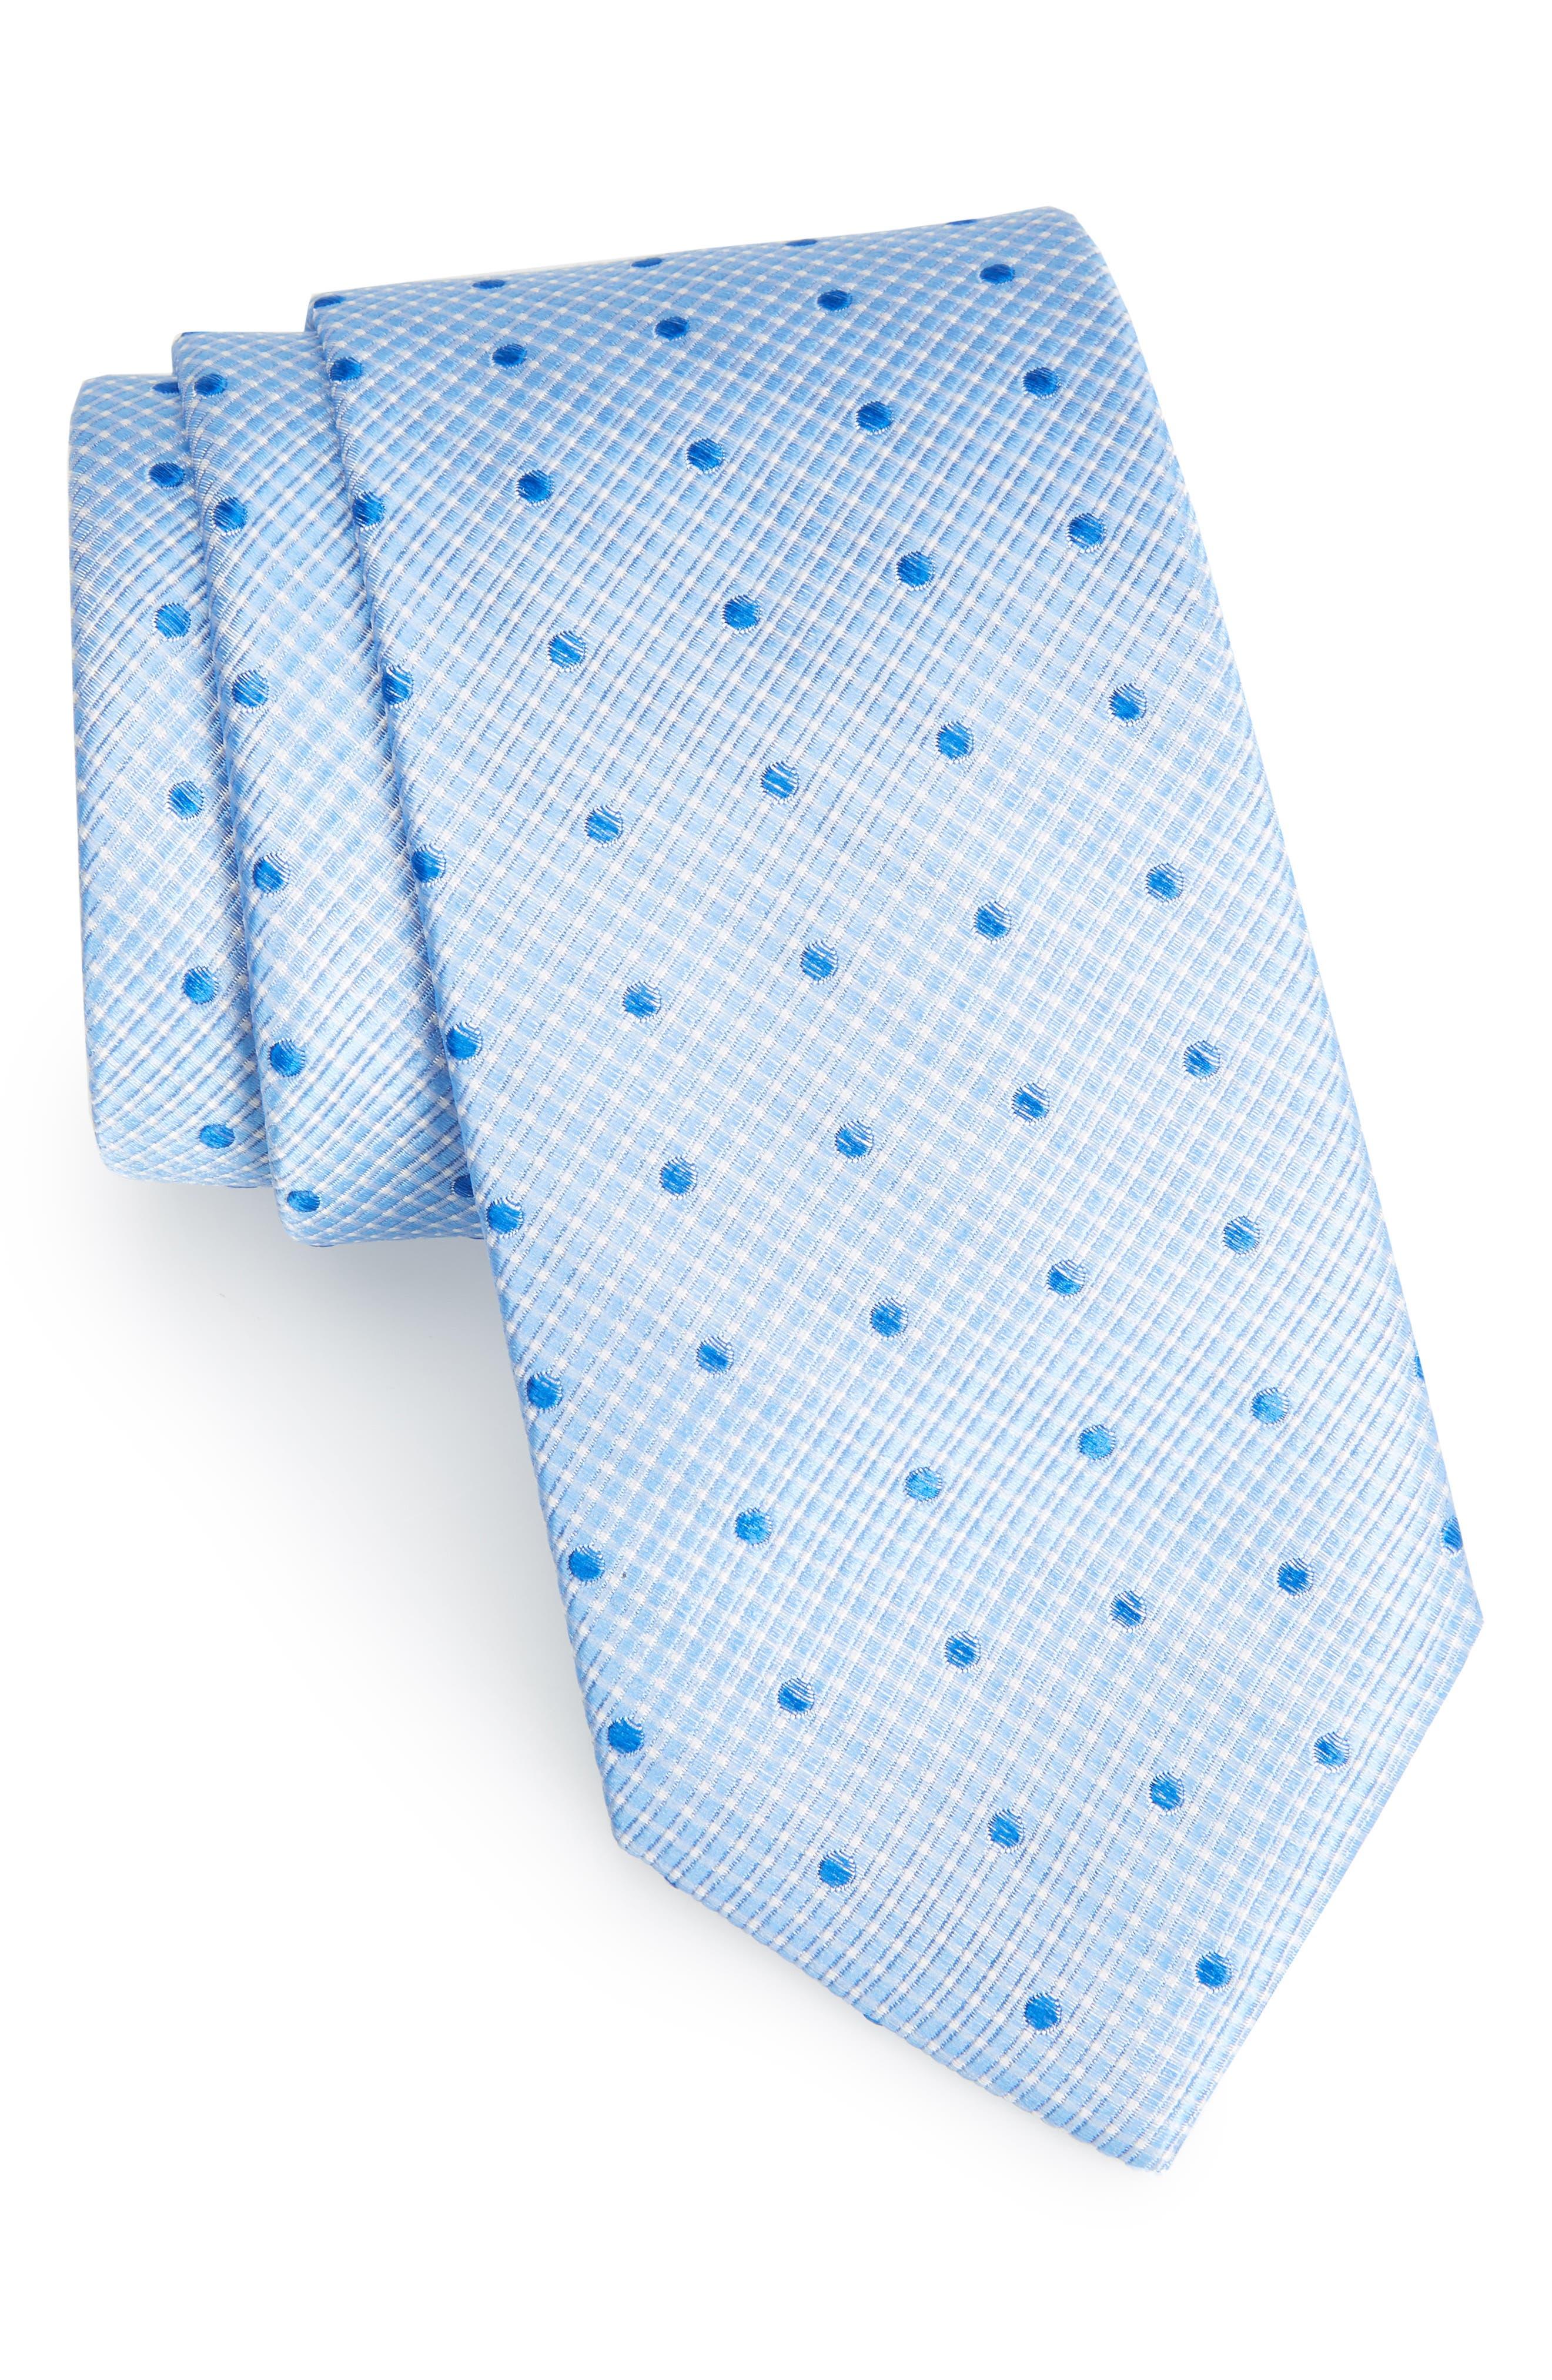 Drayton Dot Silk Tie,                             Main thumbnail 1, color,                             BLUE